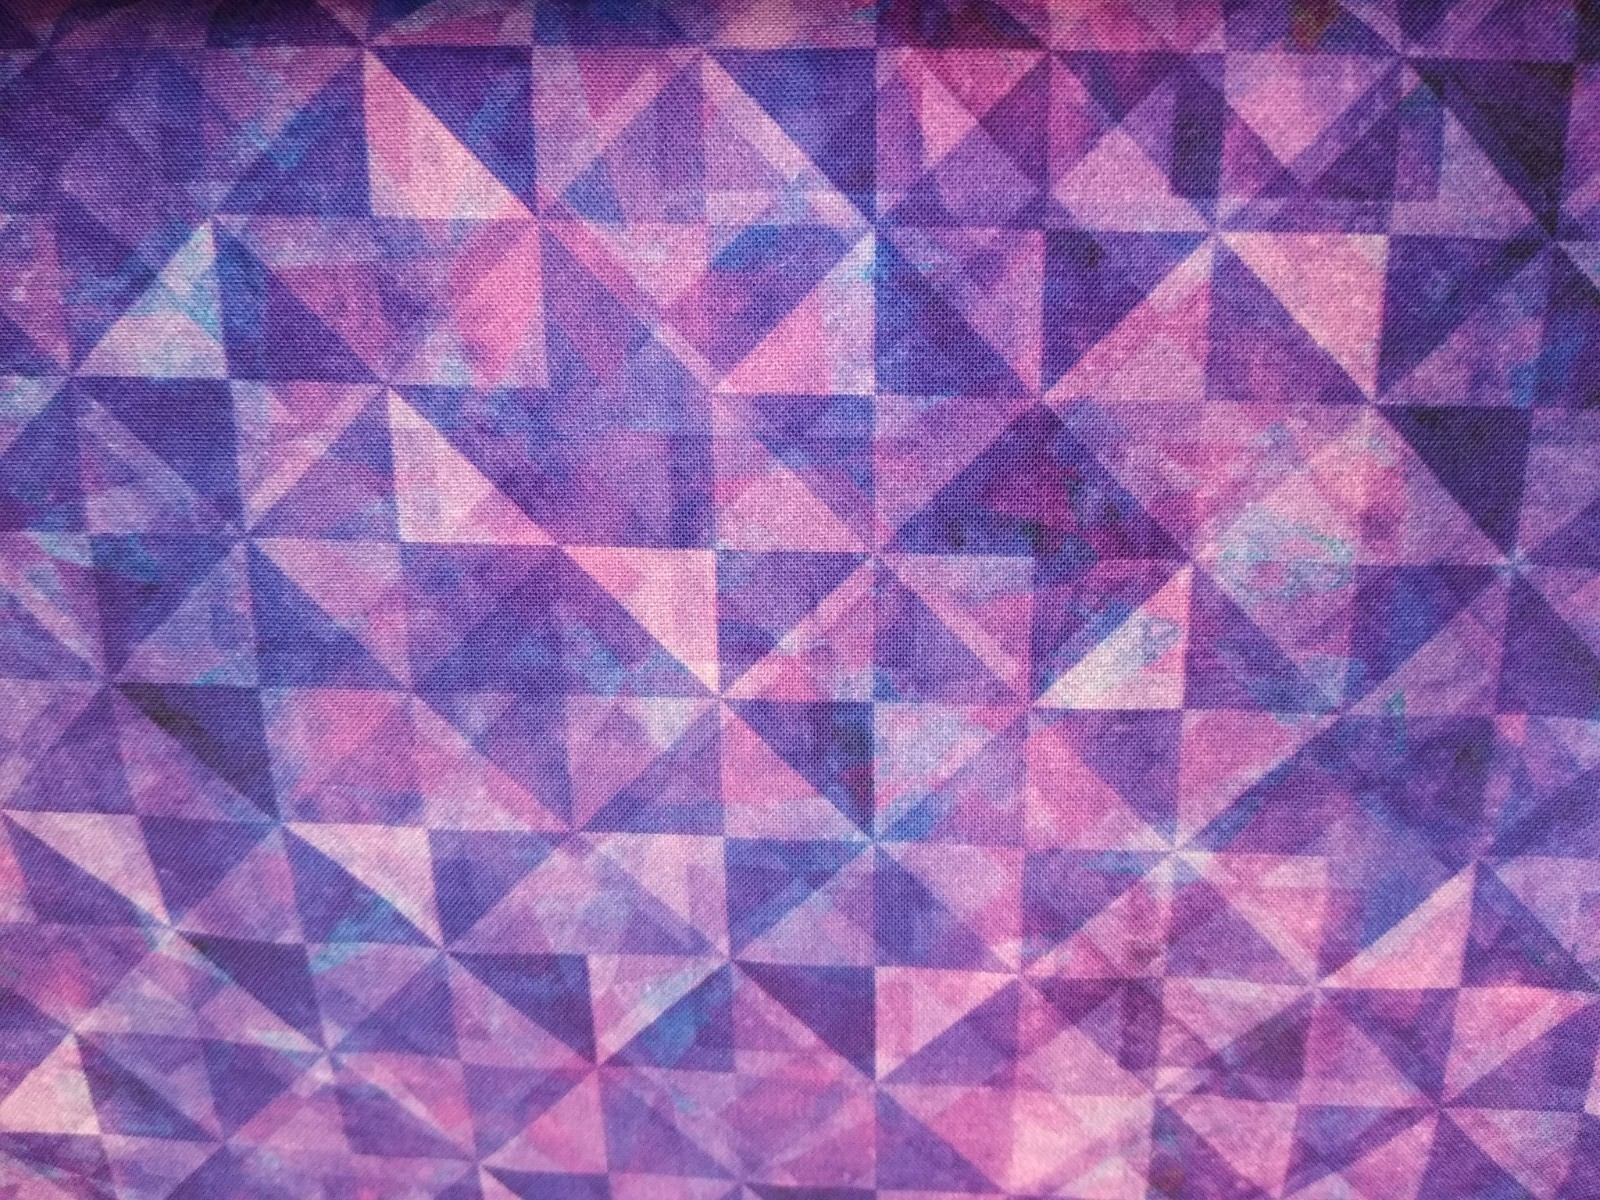 Baumwolle Kaleidoskop/ Dreiecke lila, 110cm breit, 0.5m 8,50€